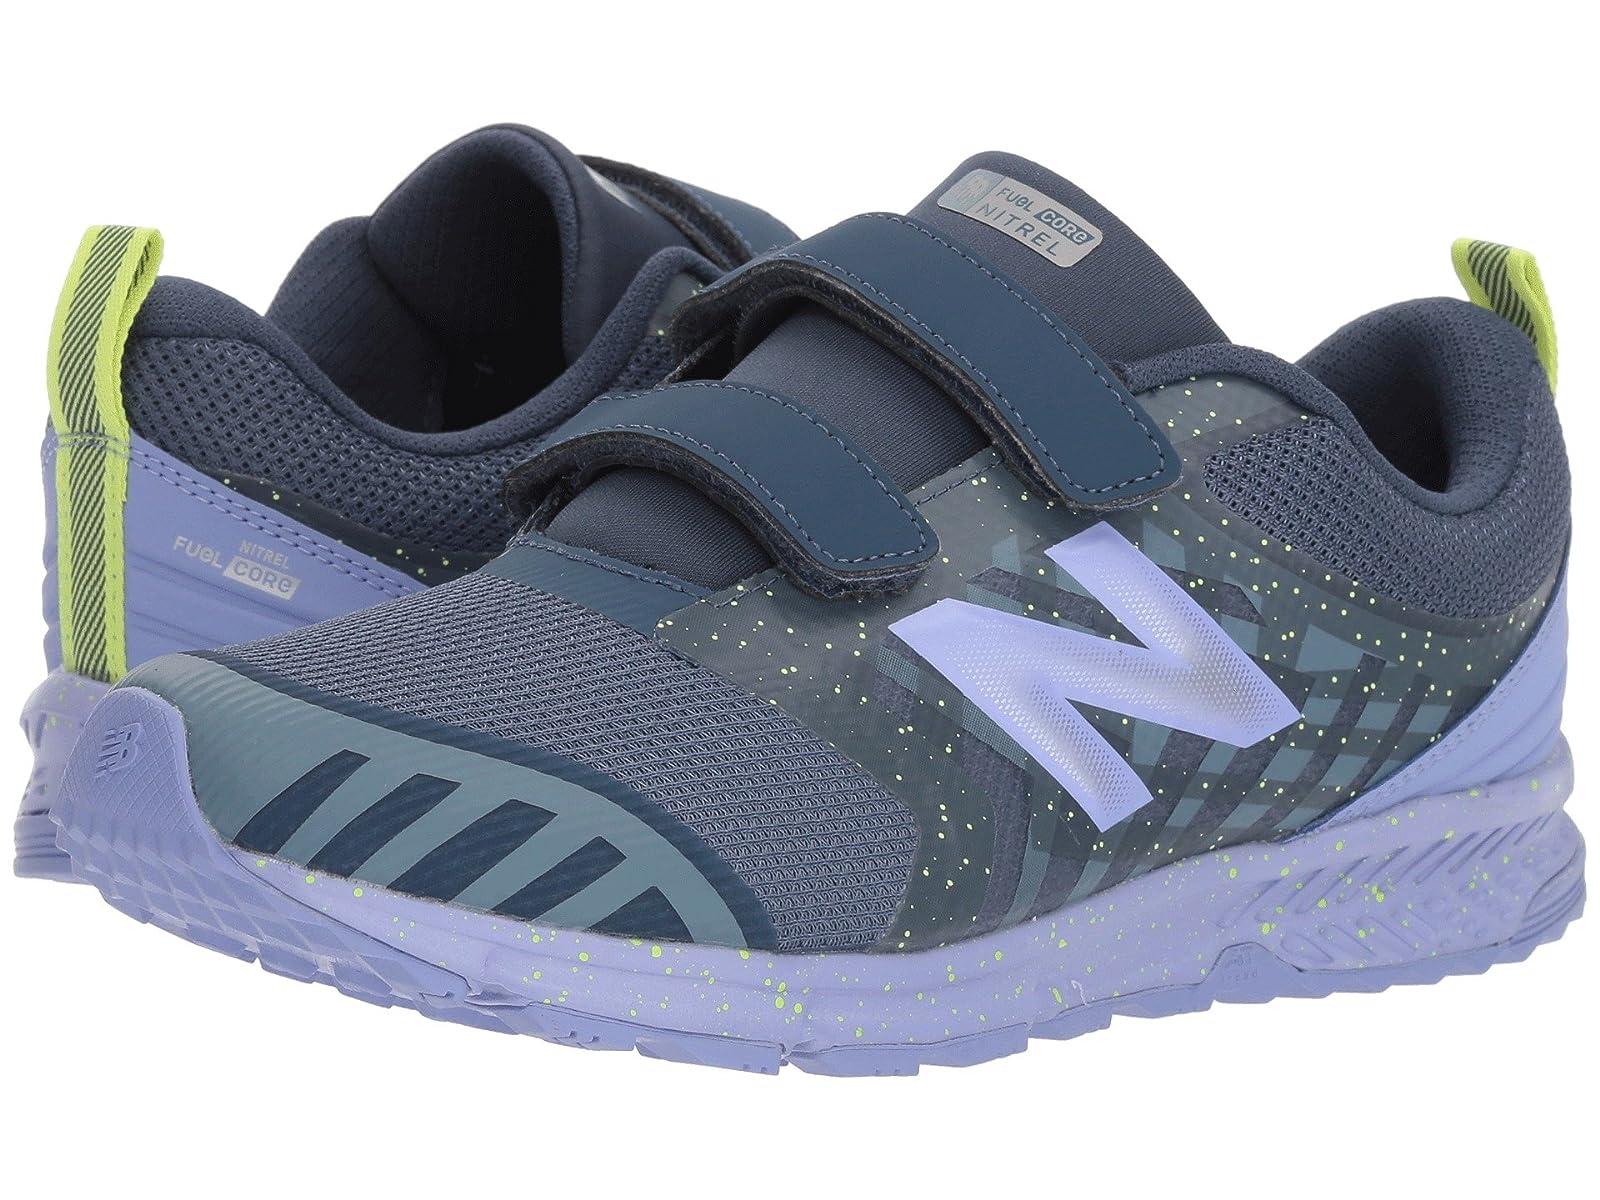 New Balance Kids FuelCore NITREL (Little Kid/Big Kid)Atmospheric grades have affordable shoes